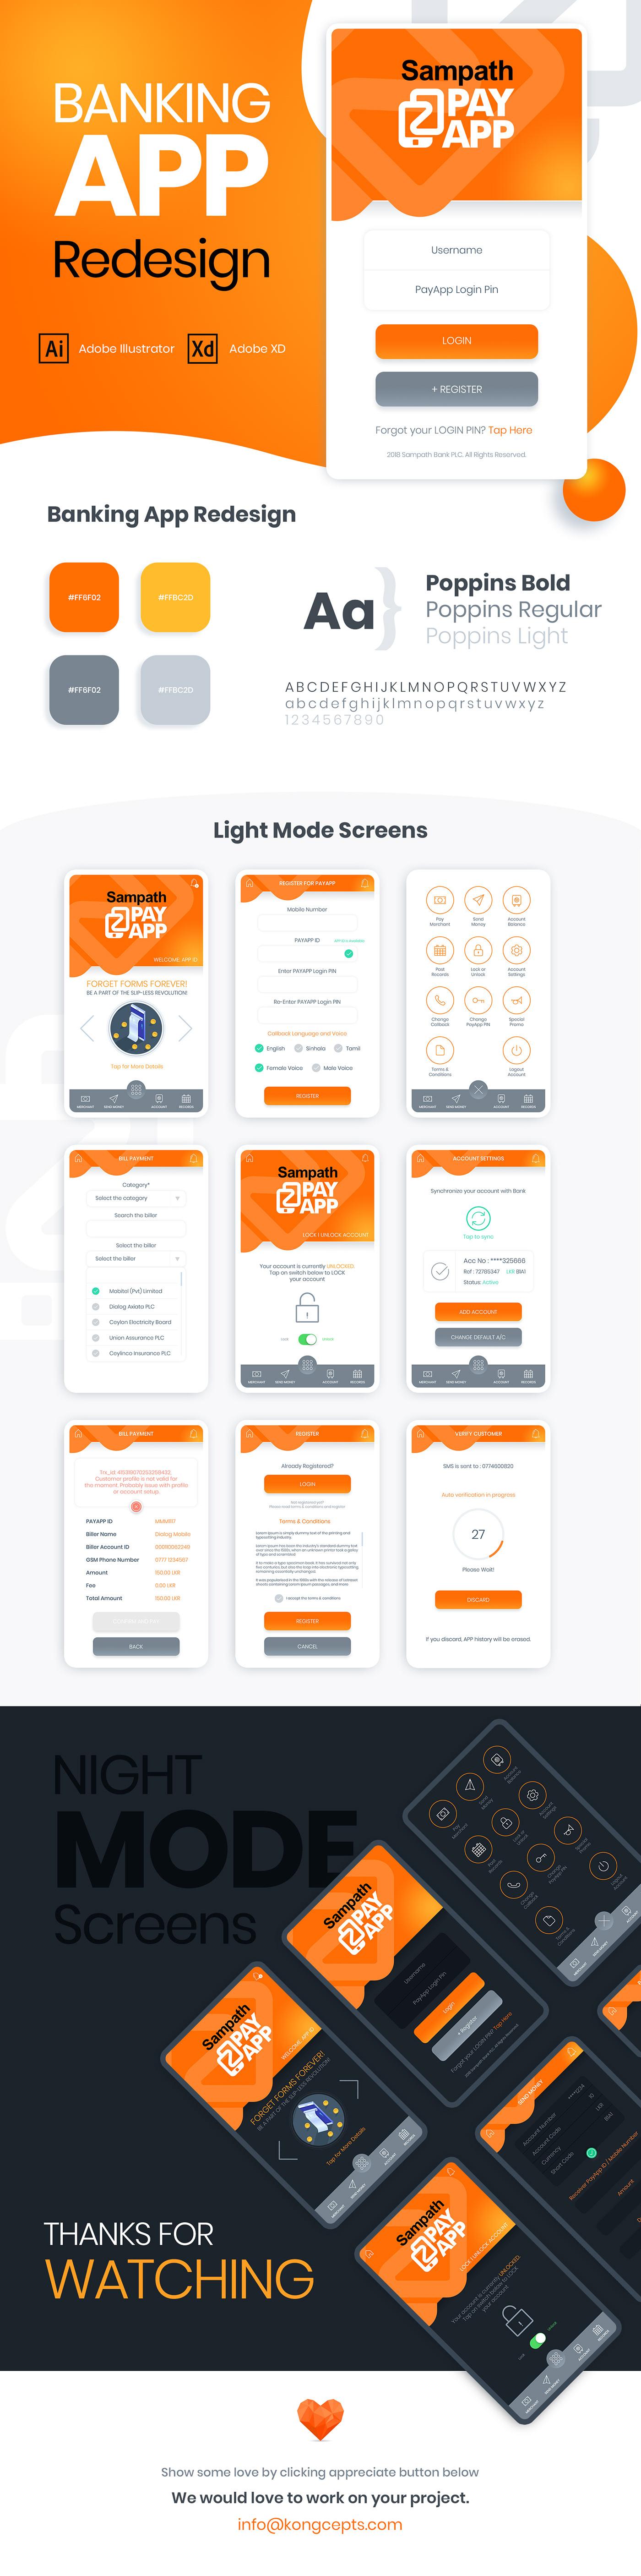 financial app banking app bank app  financial orange iOS App mobile app design Ecommerce Bank